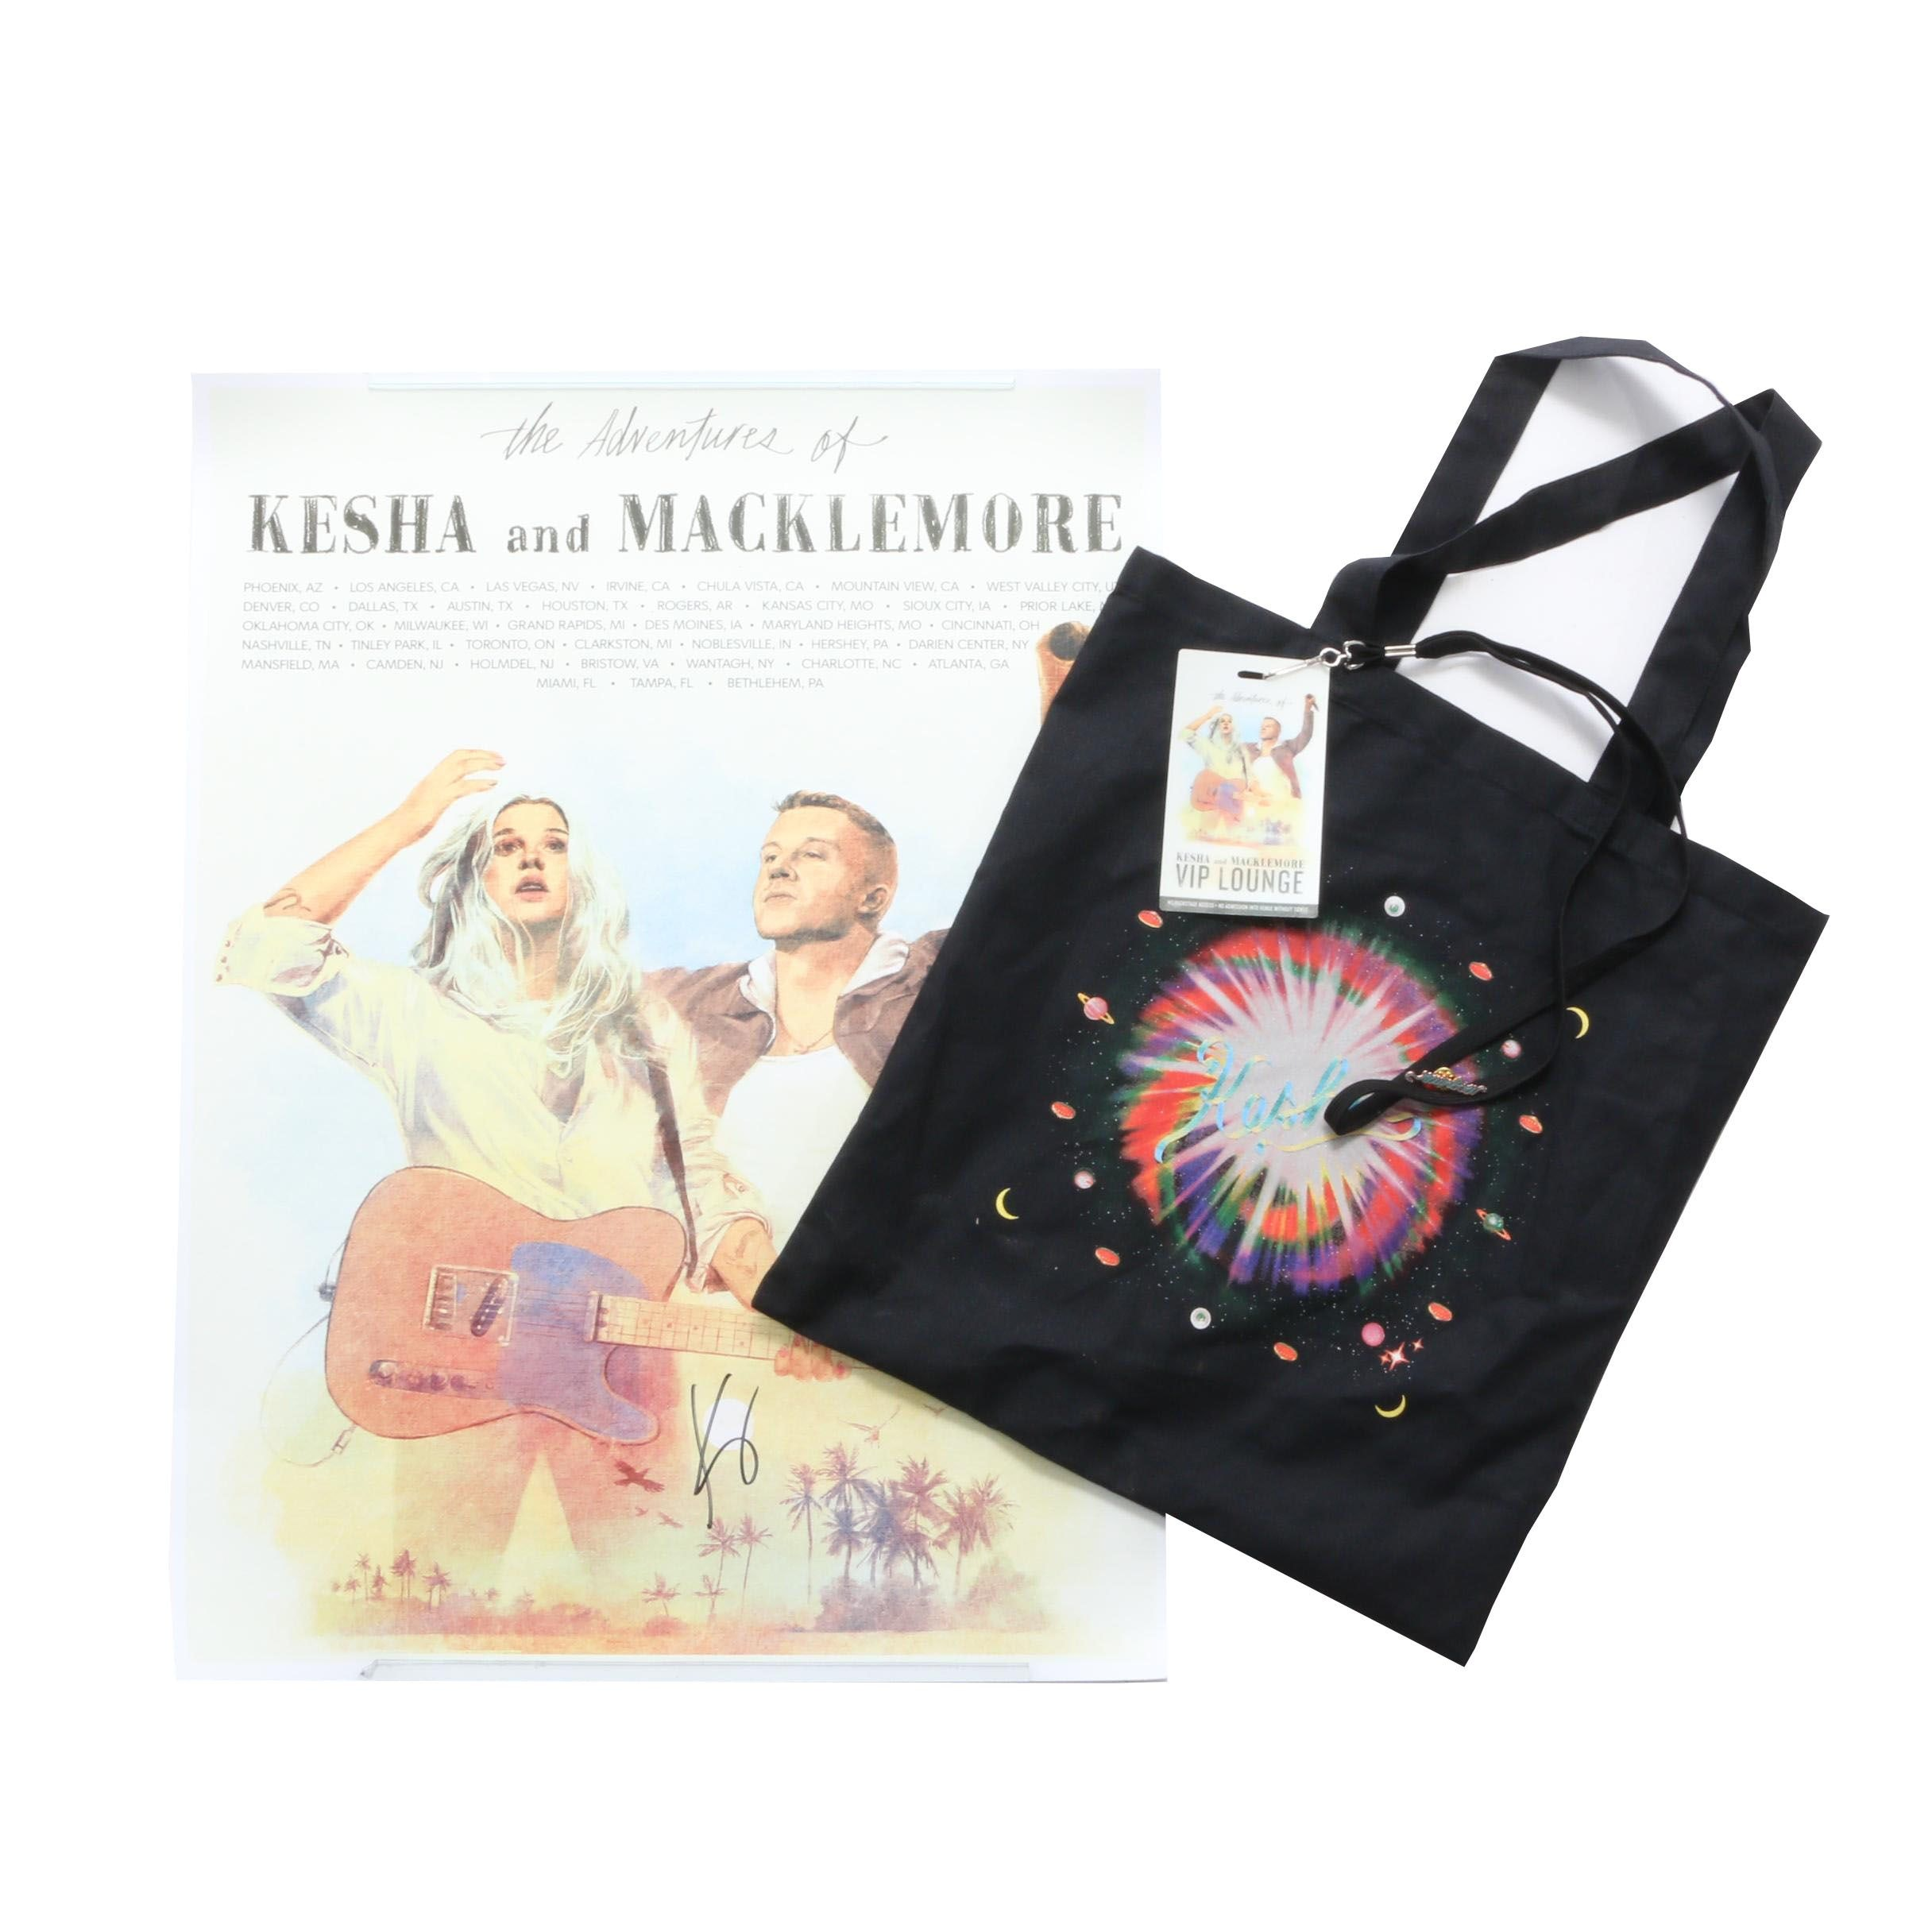 Kesha Autographed Concert Poster and Black Cotton Bag